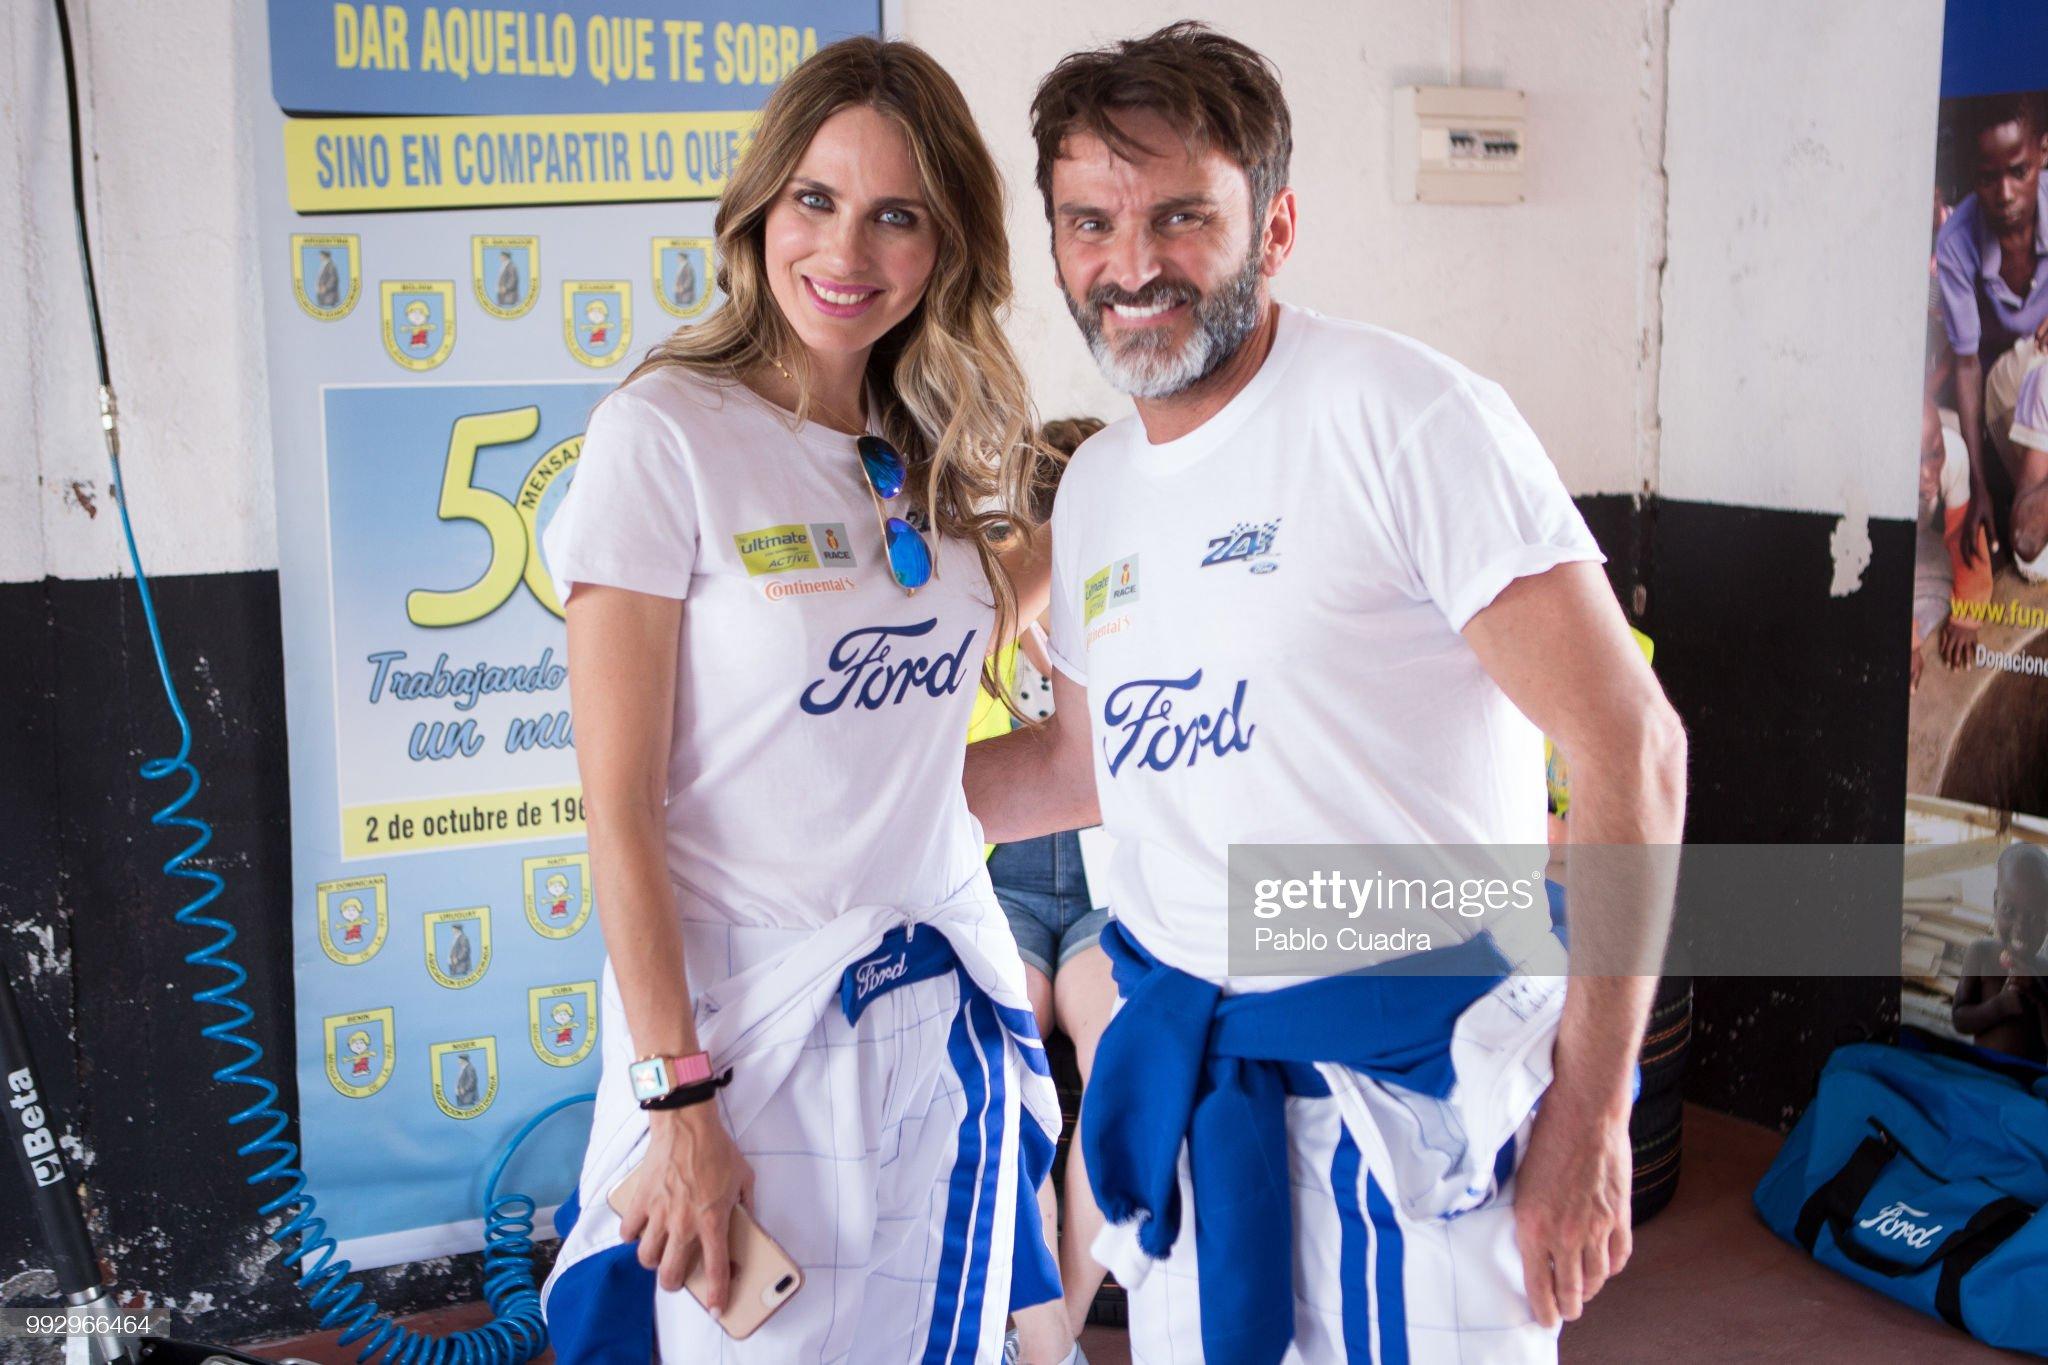 ¿Cuánto mide Vanesa Romero? - Altura - Página 2 Vanesa-romero-and-fernando-tejero-attend-the-24-horas-ford-charity-picture-id992966464?s=2048x2048